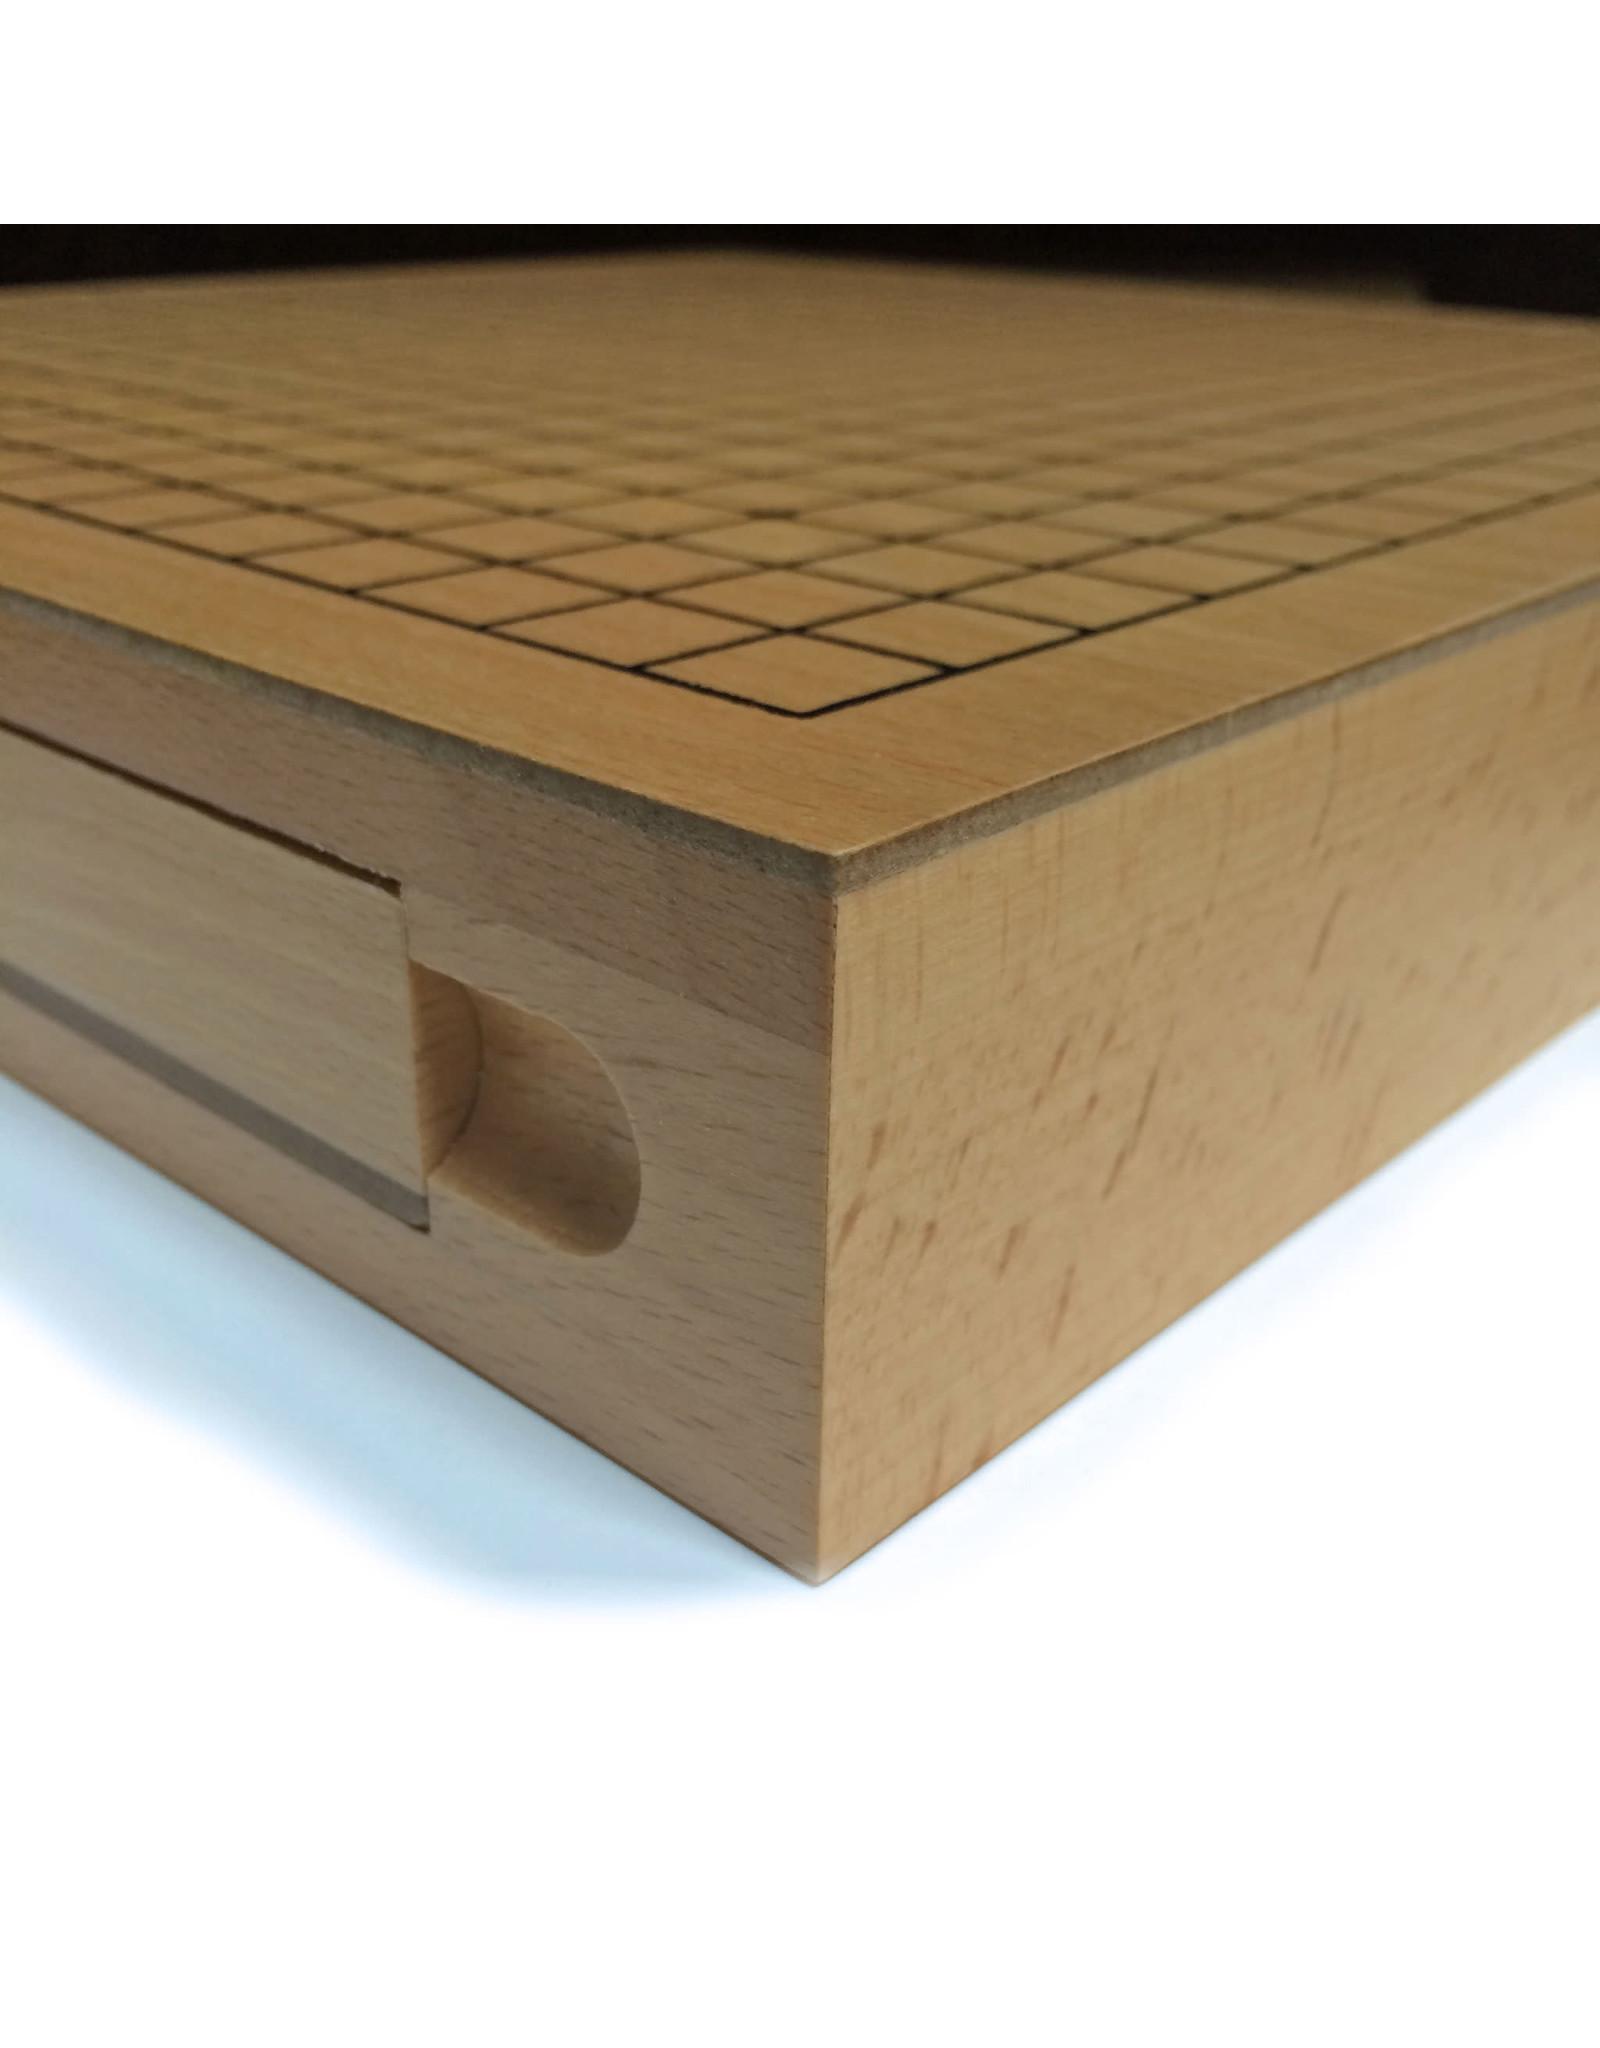 Wood Expressions 12 Inch Wood GO Set w/ Drawers